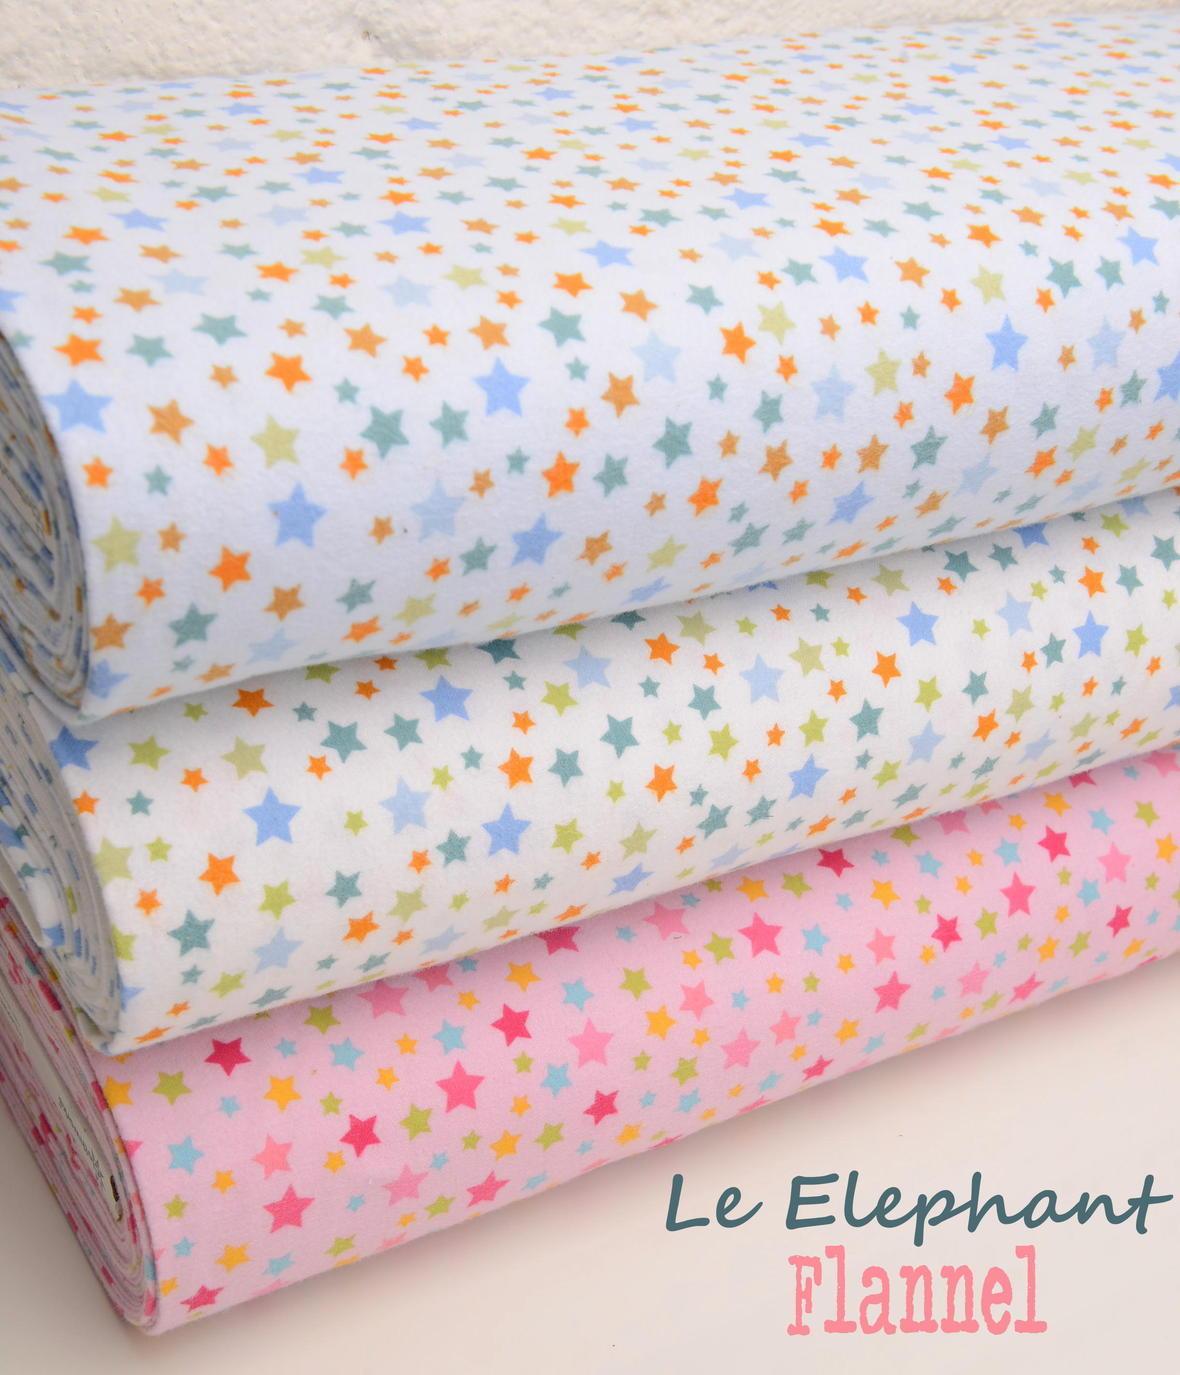 Le Elephant Flannel